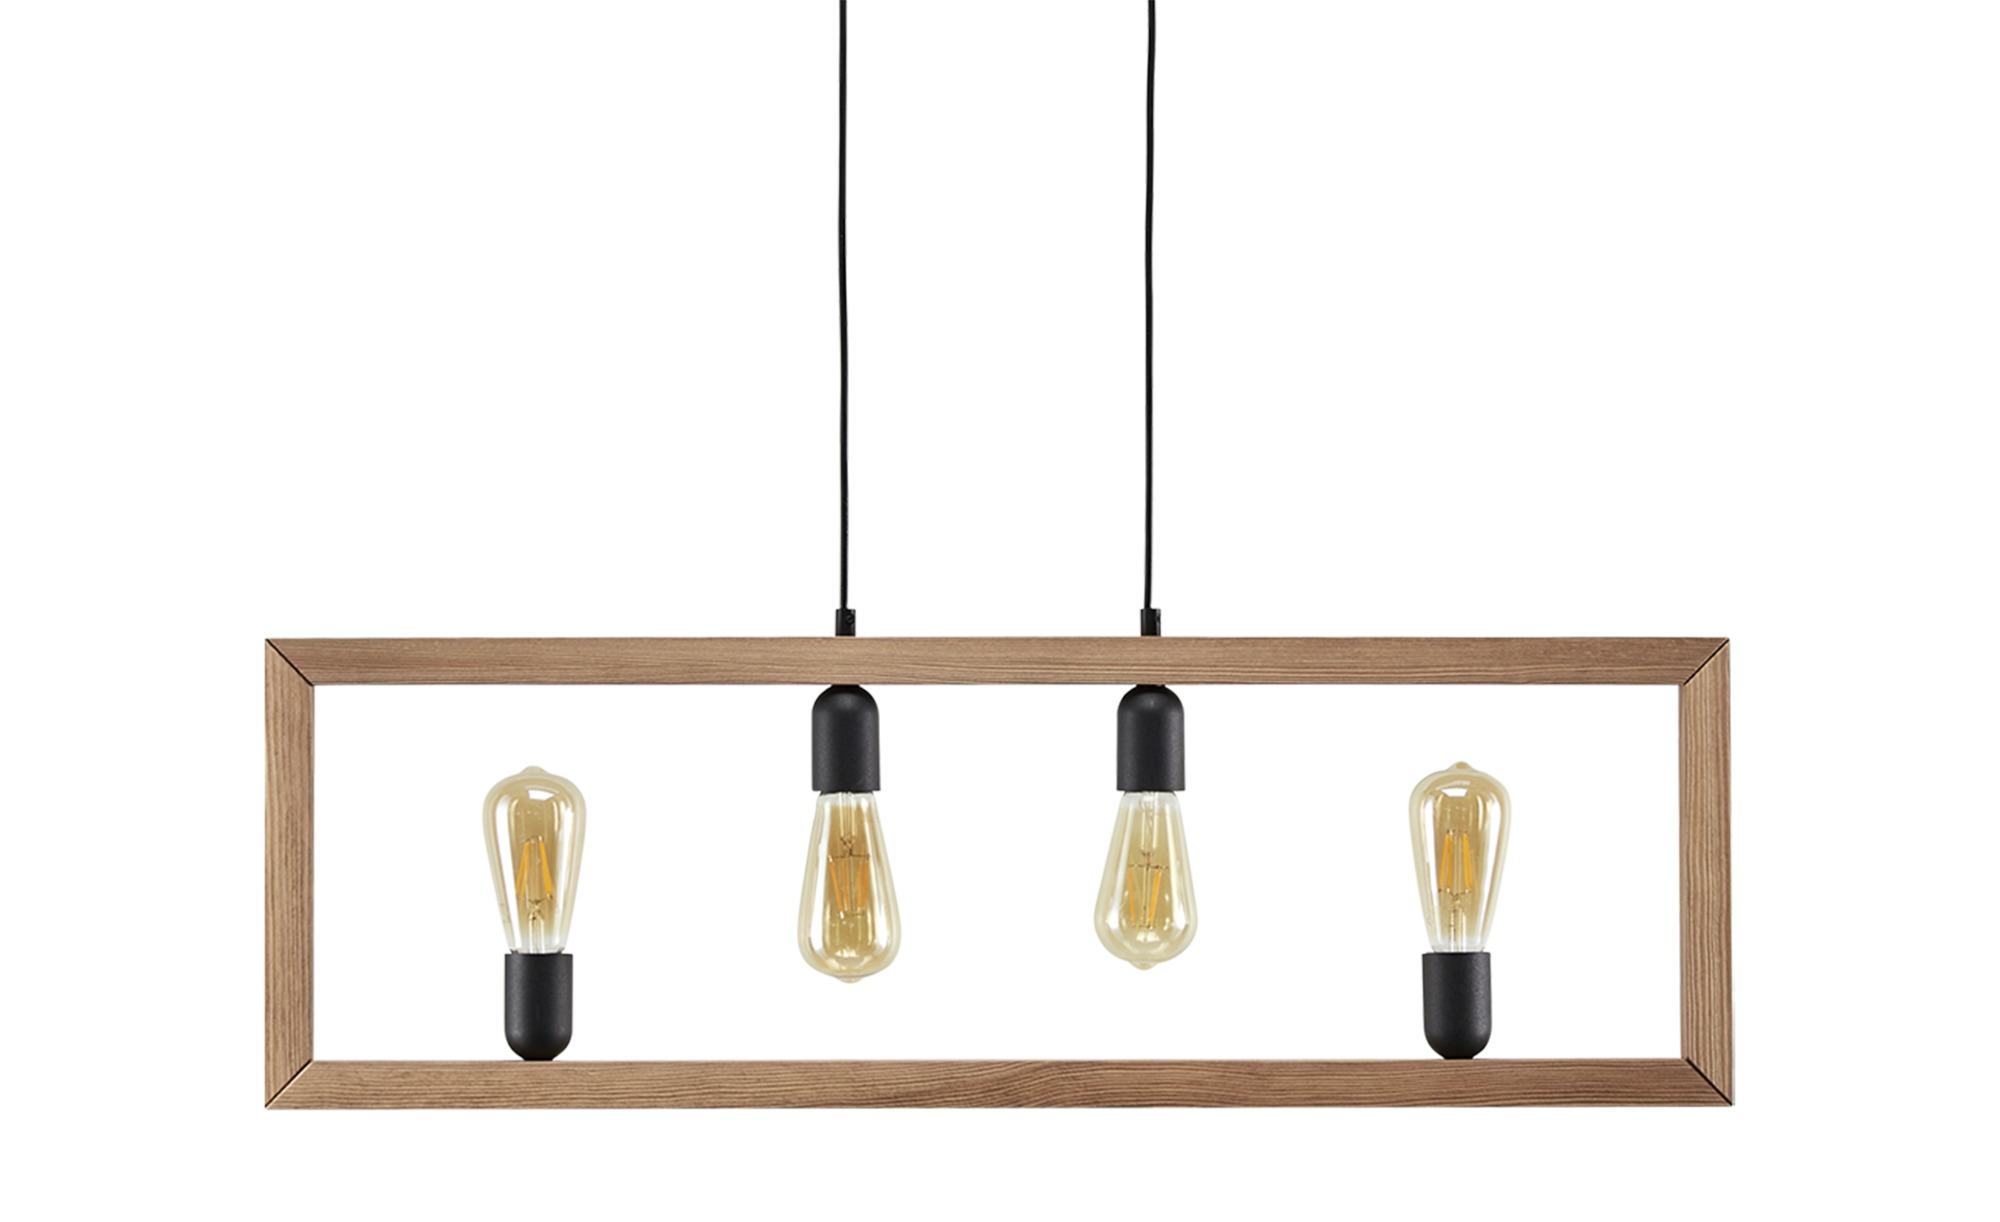 Pendelleuchte, 4-flammig, Holz ¦ holzfarben ¦ Maße (cm): B: 89 H: 99 Lampen & Leuchten > Innenleuchten > Pendelleuchten - Höffner